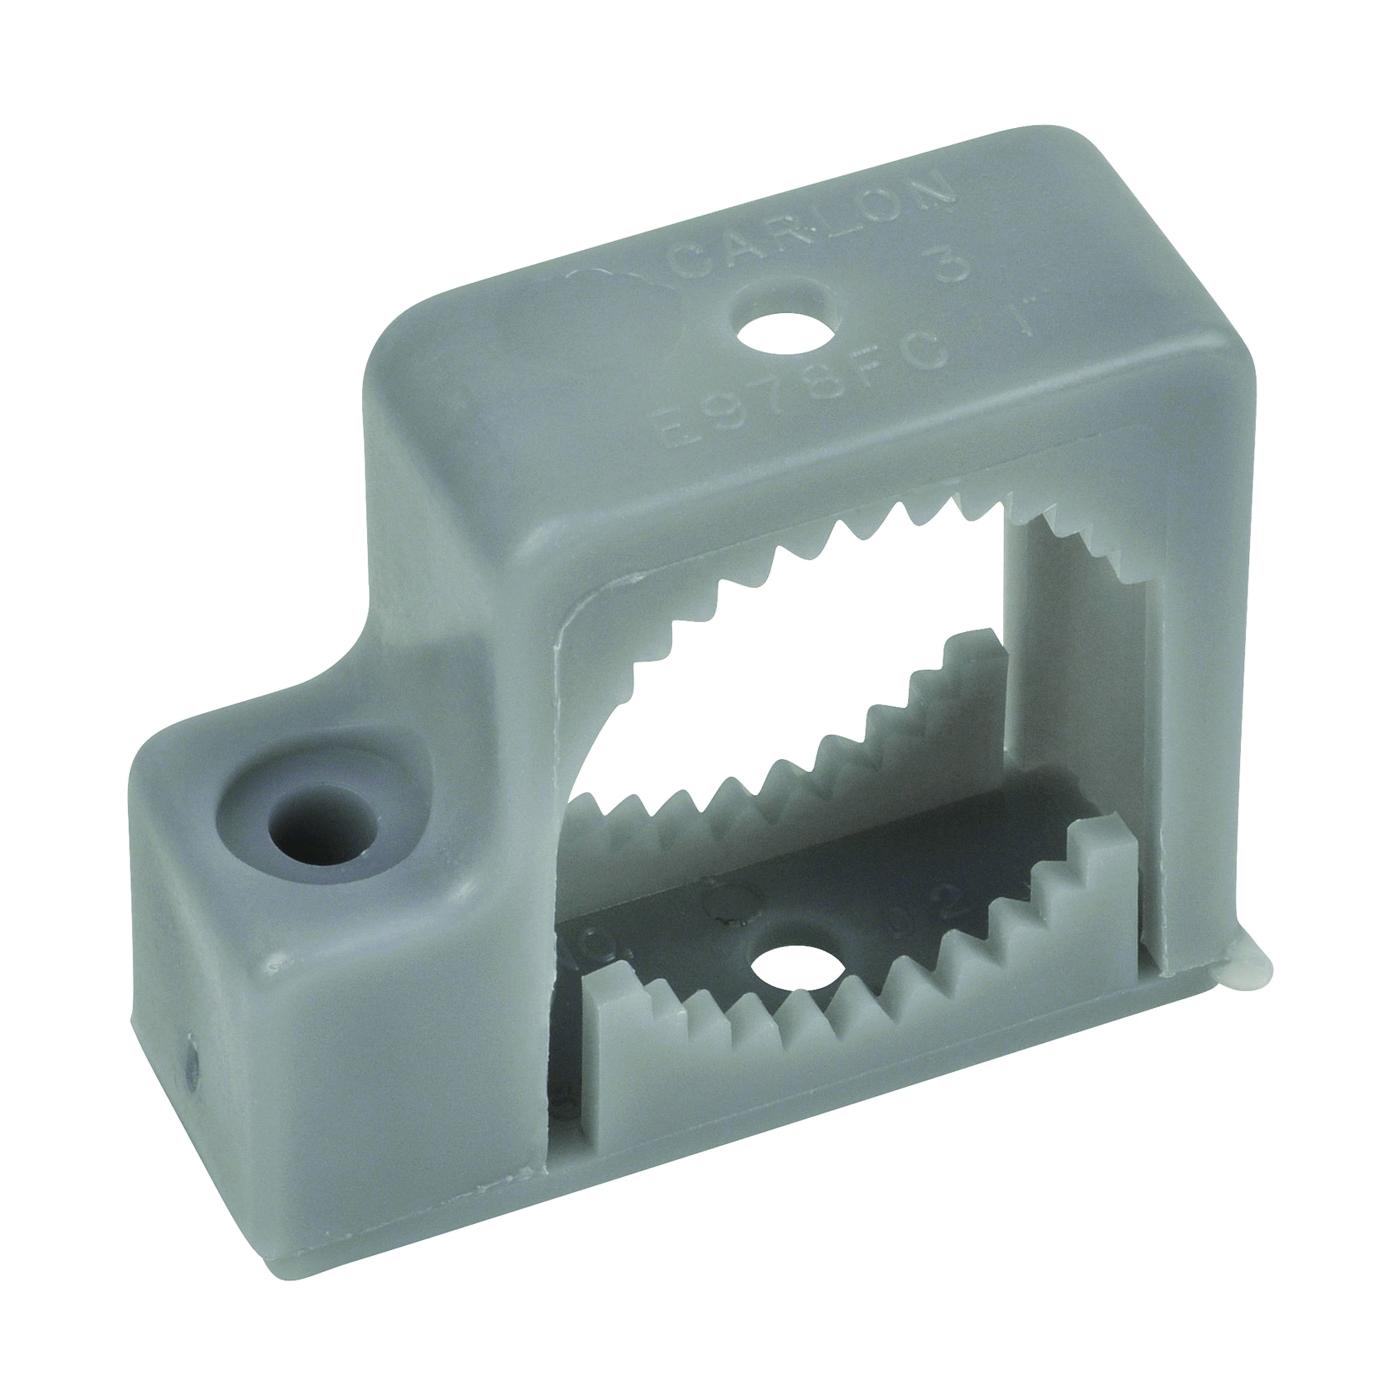 Picture of Carlon E978EC-CAR Conduit Support Strap, Polypropylene, Gray